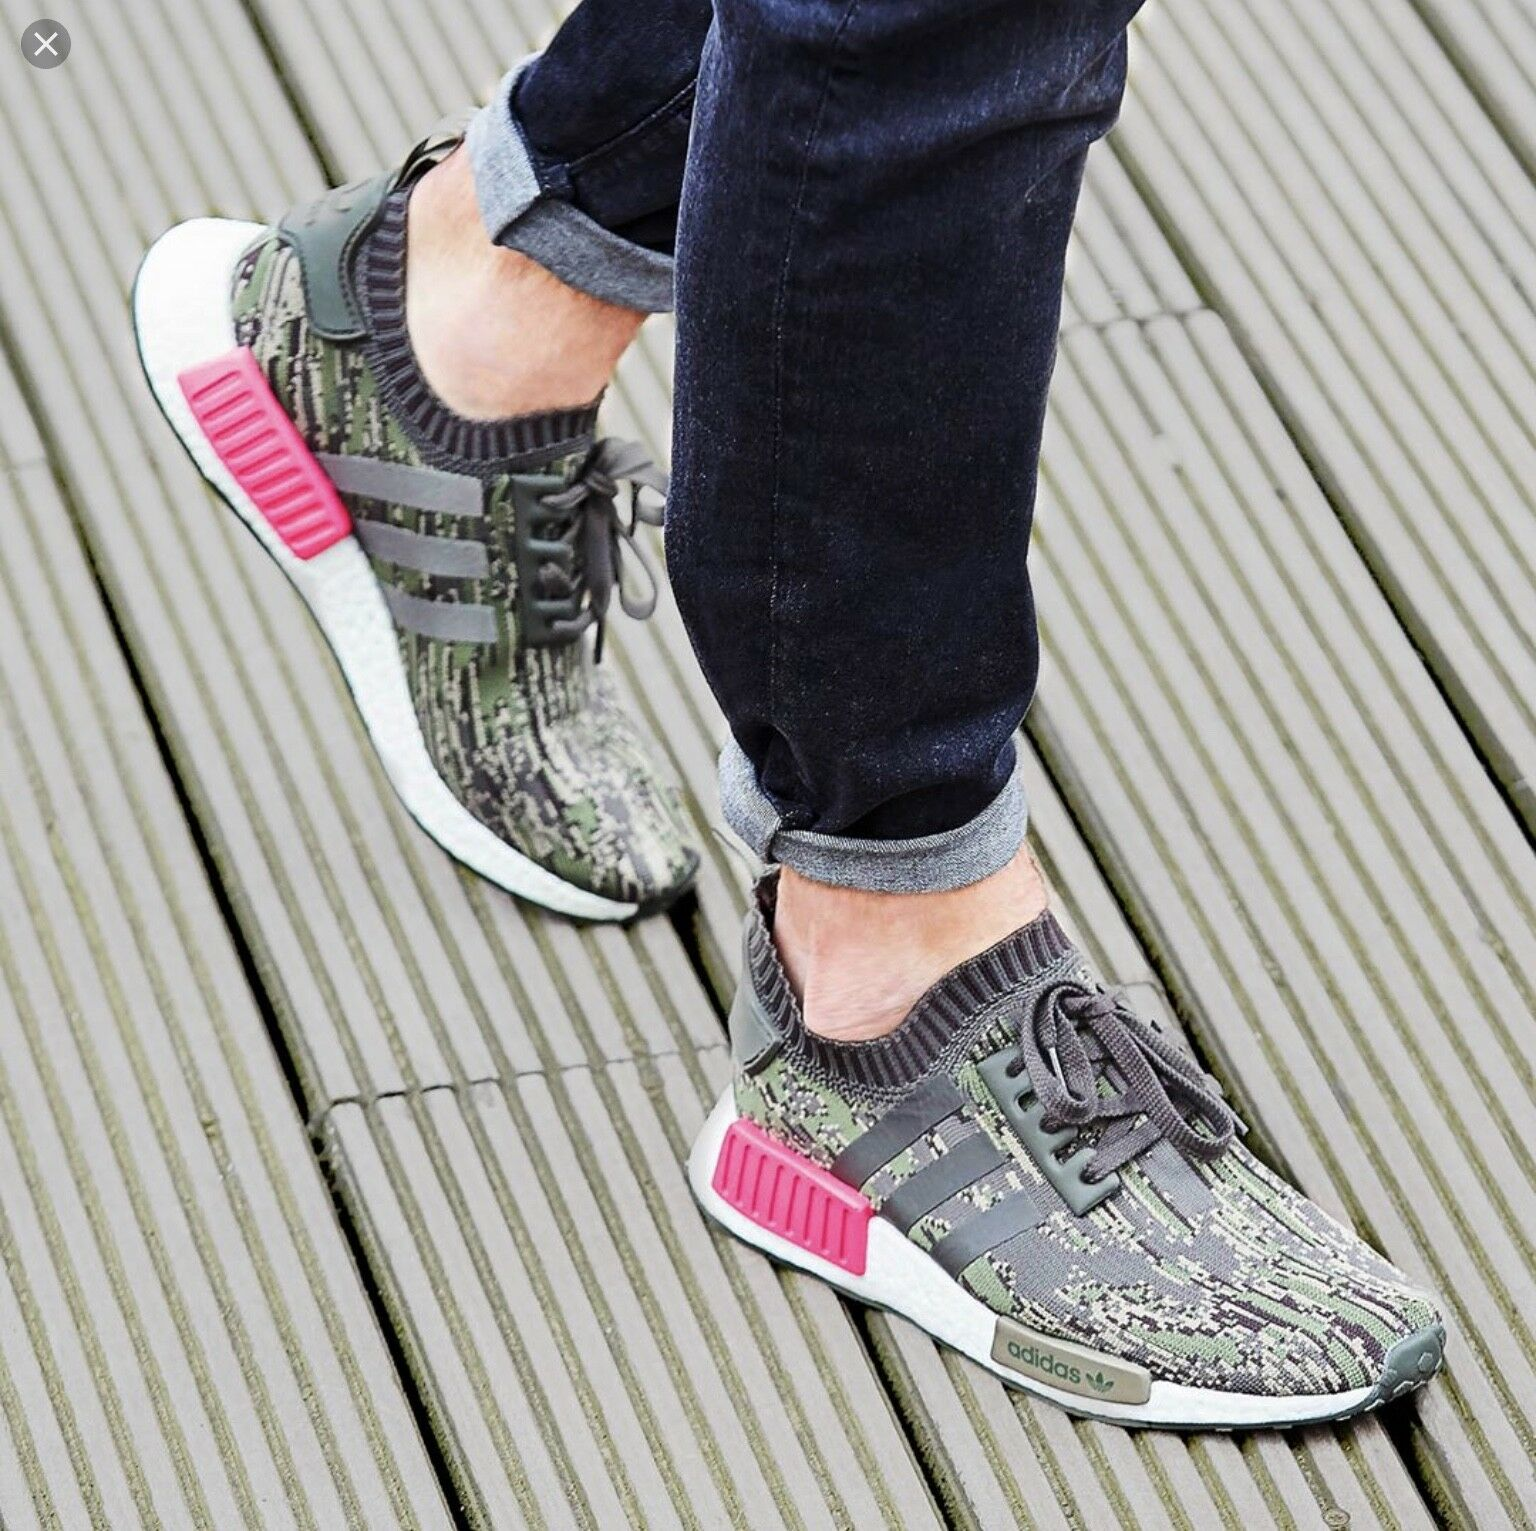 Adidas NMD Primeknit Sneakers BZ0222 R1 Originals nrmyki4859